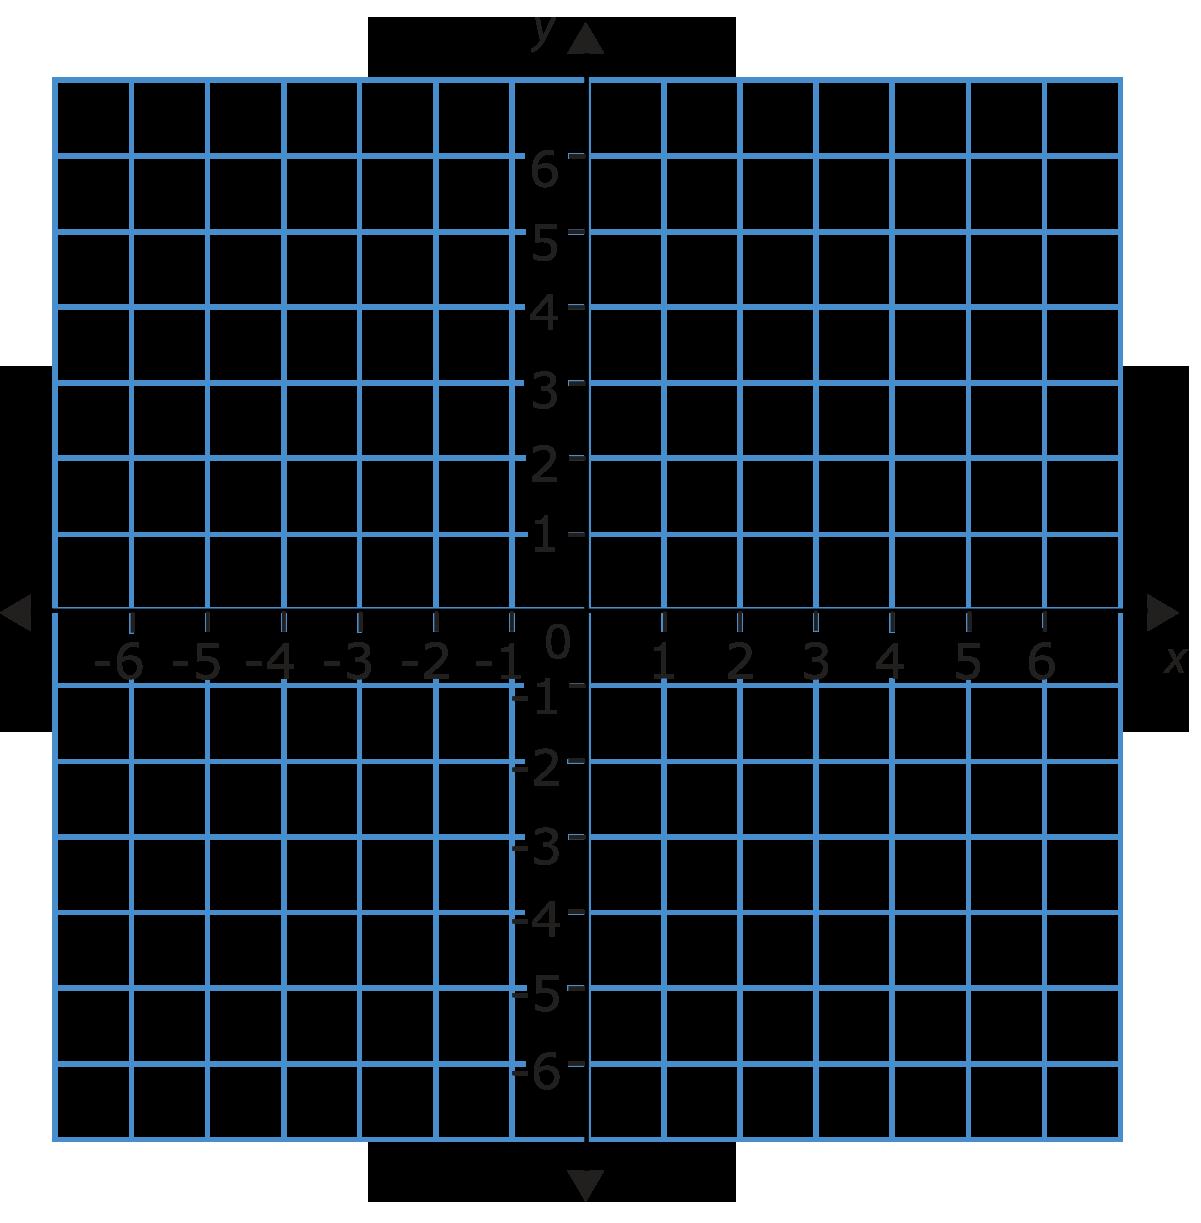 Uncategorized Plotting Coordinates Worksheets uncategorized math quadrants worksheets bidwellranchcam resume site coordinate plot the coordinates sheet 4